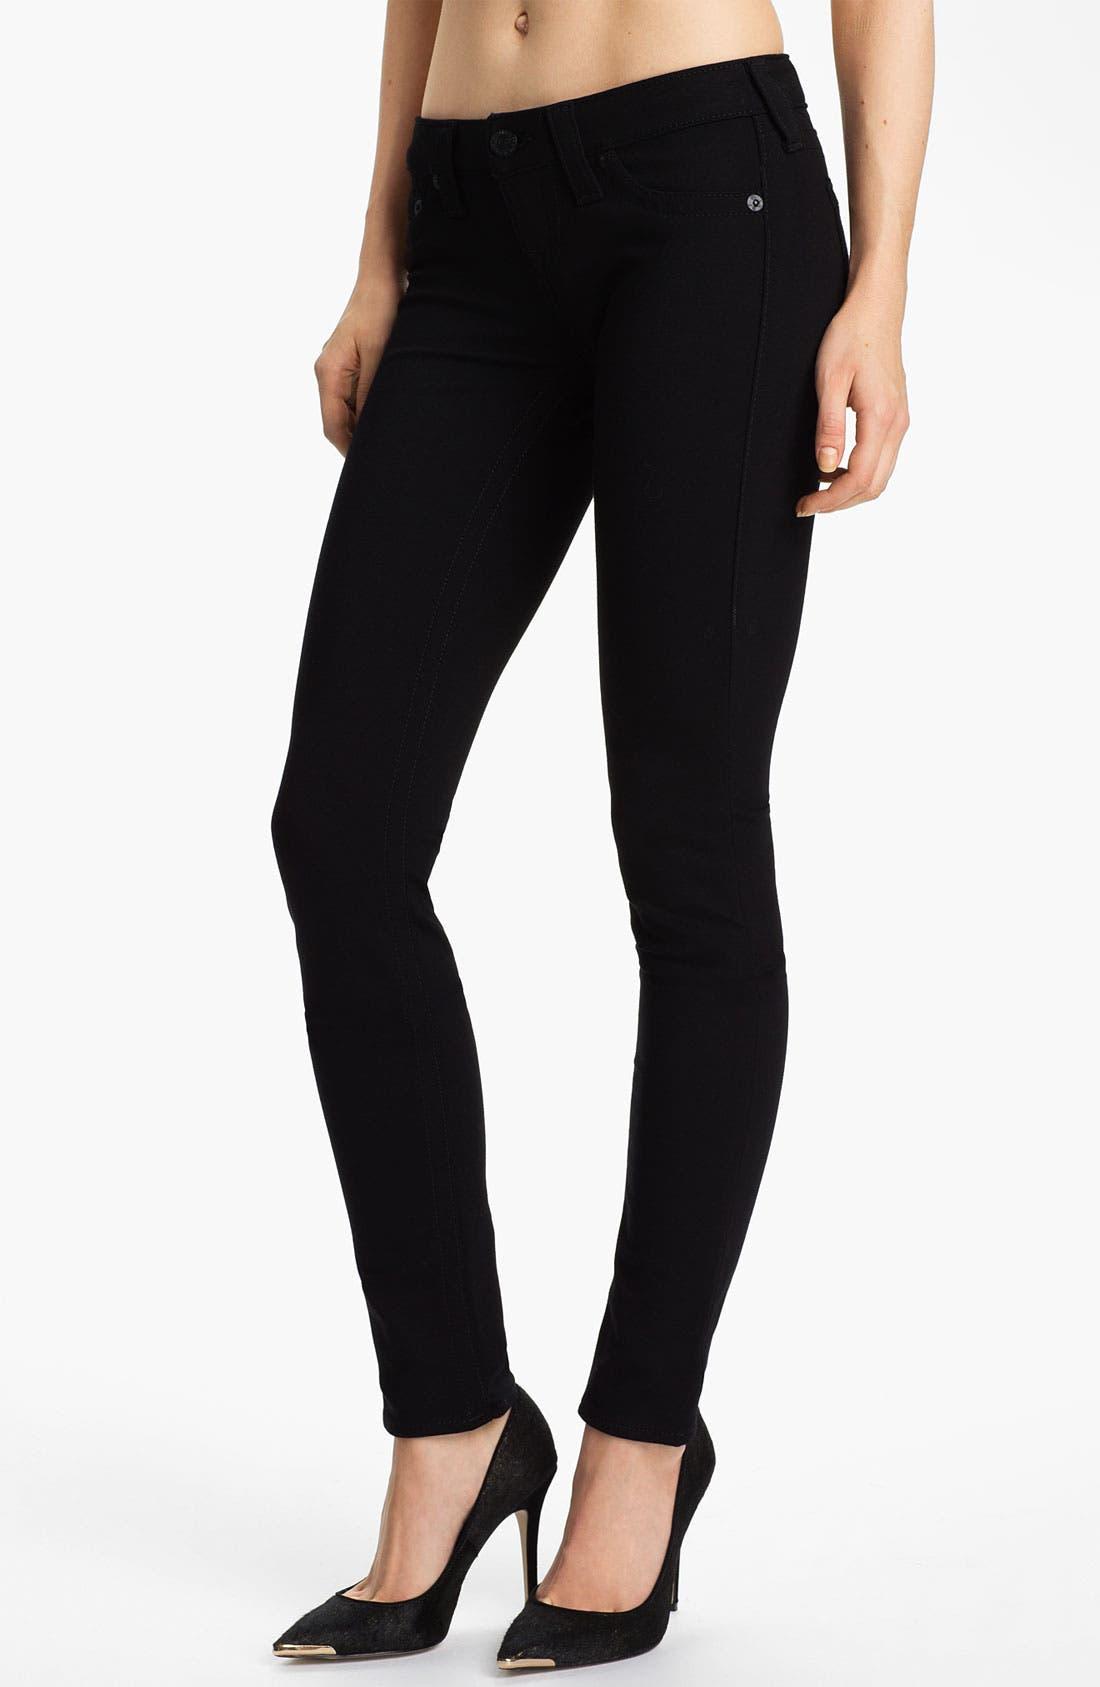 Main Image - True Religion Brand Jeans 'Stella' Stretch Ponte Knit Pants